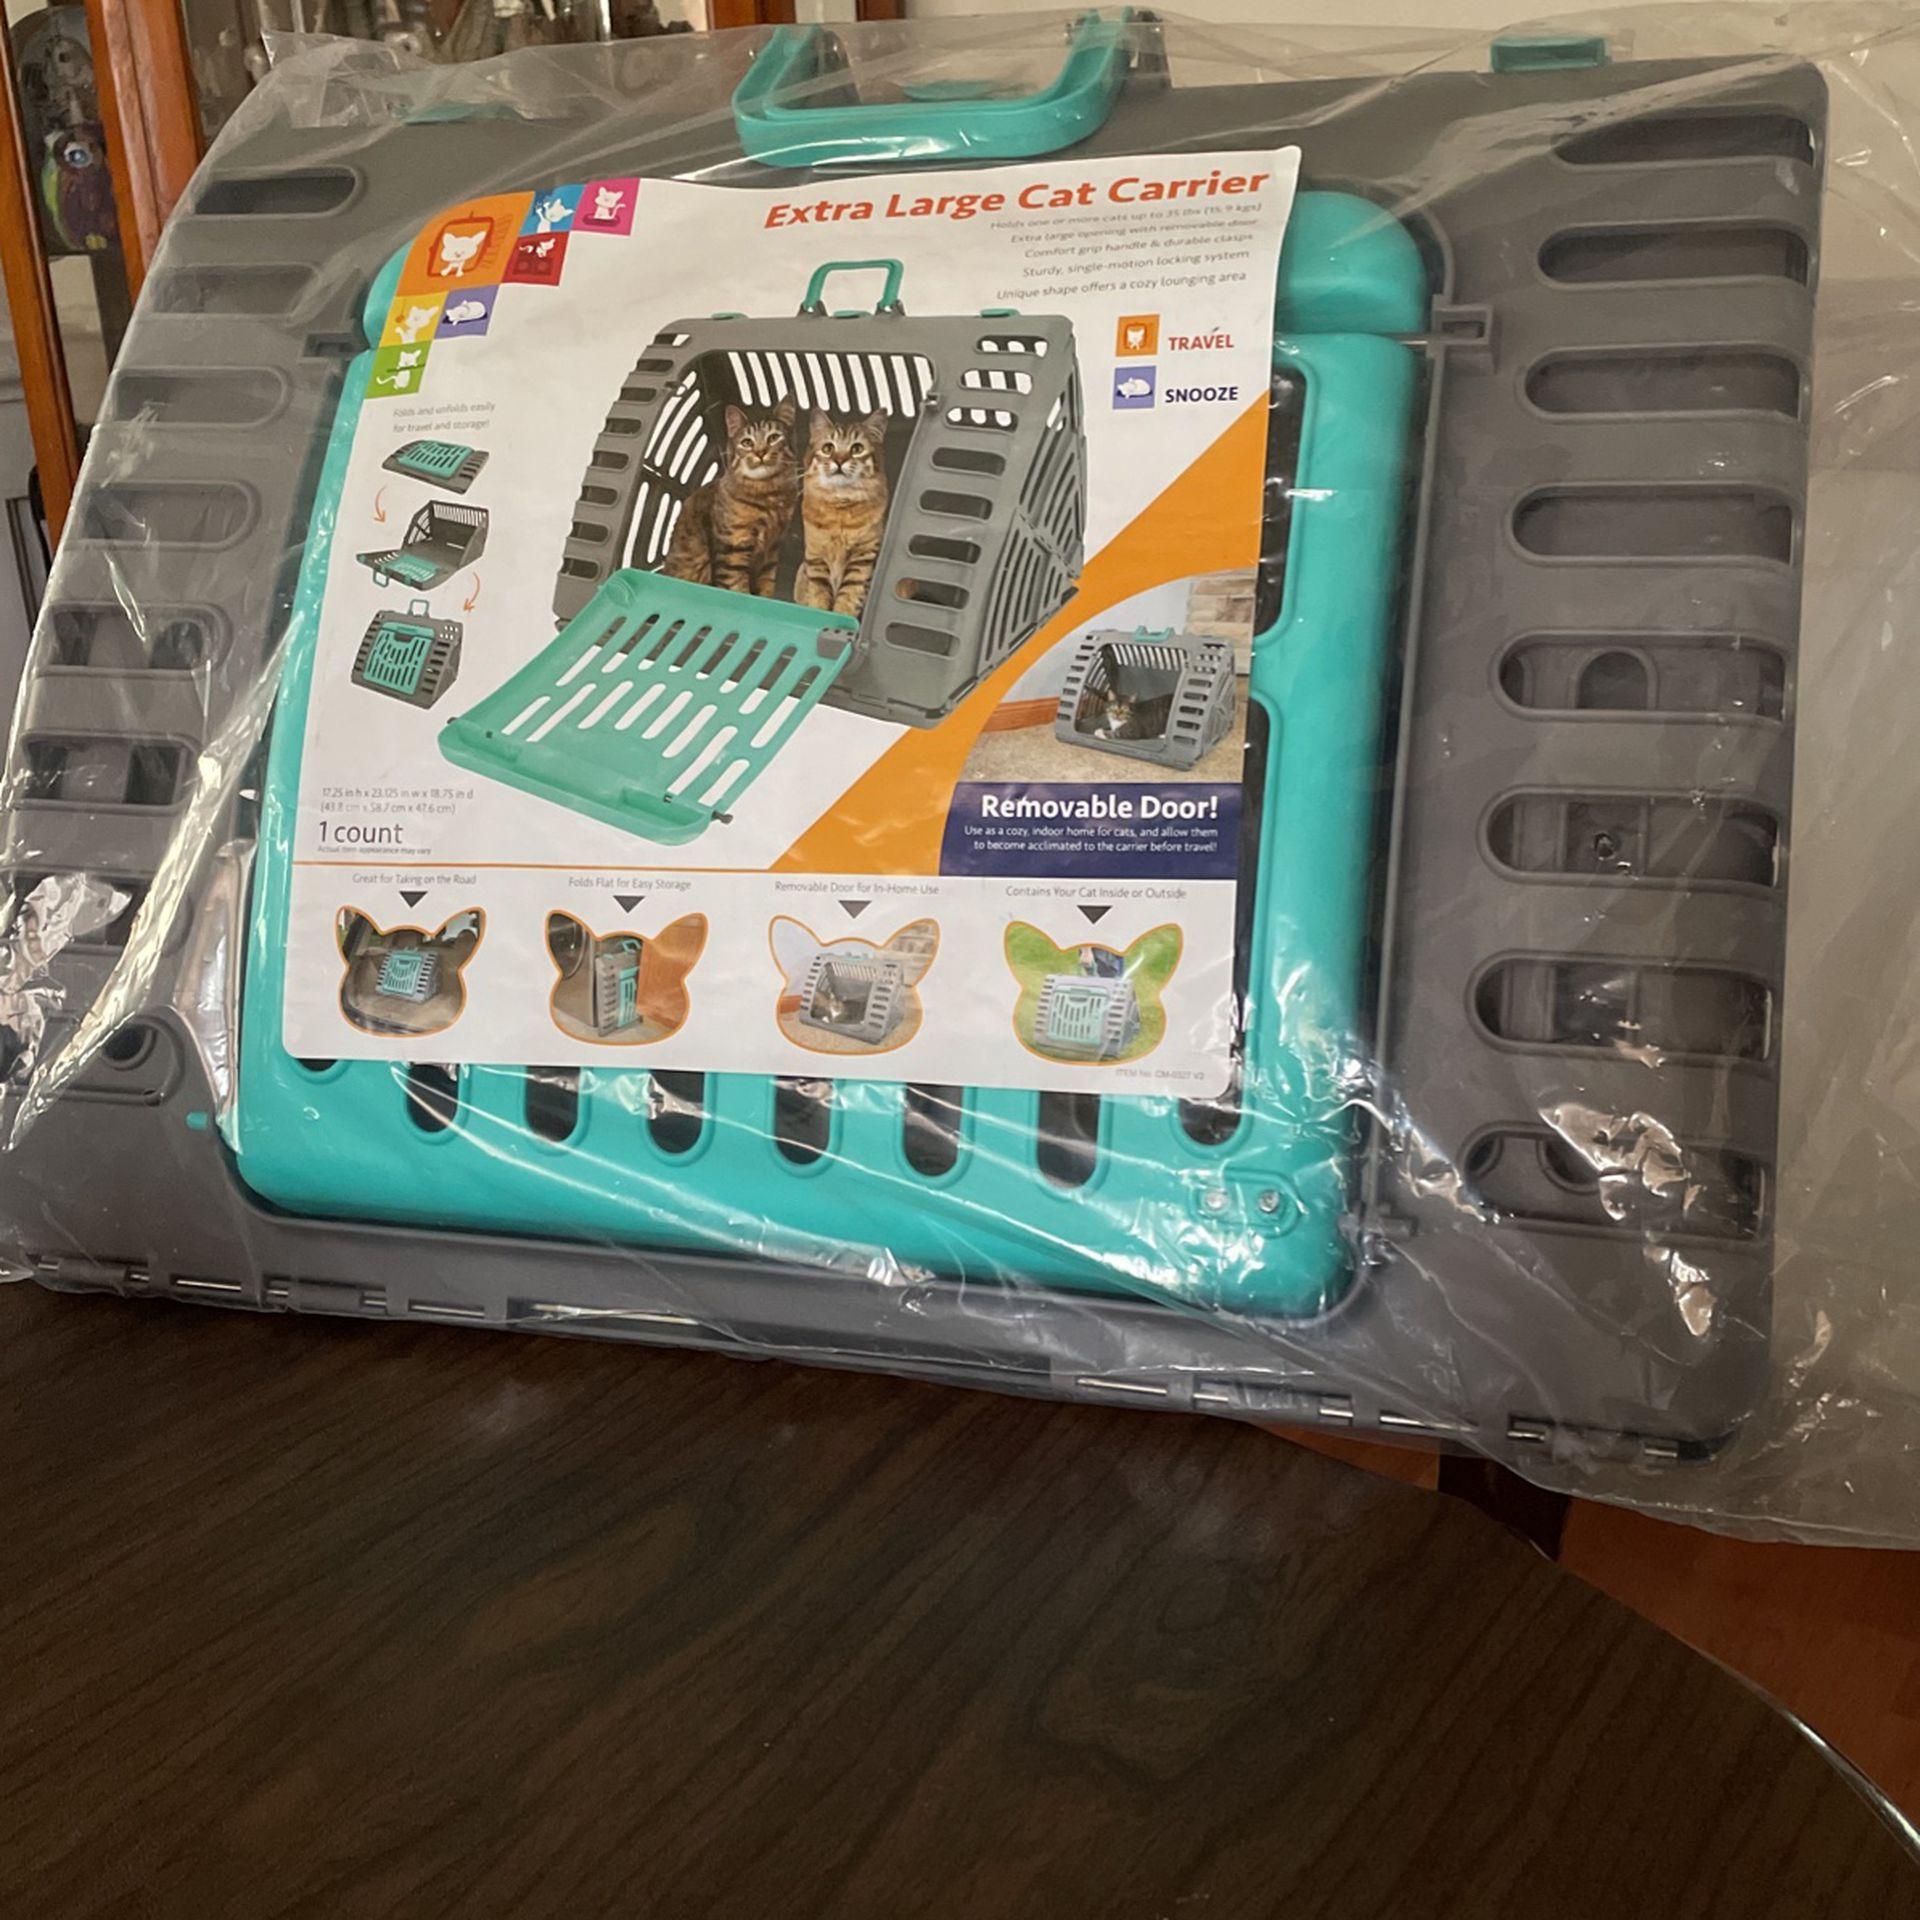 New X-lg SportPet Portable Cat Carrier